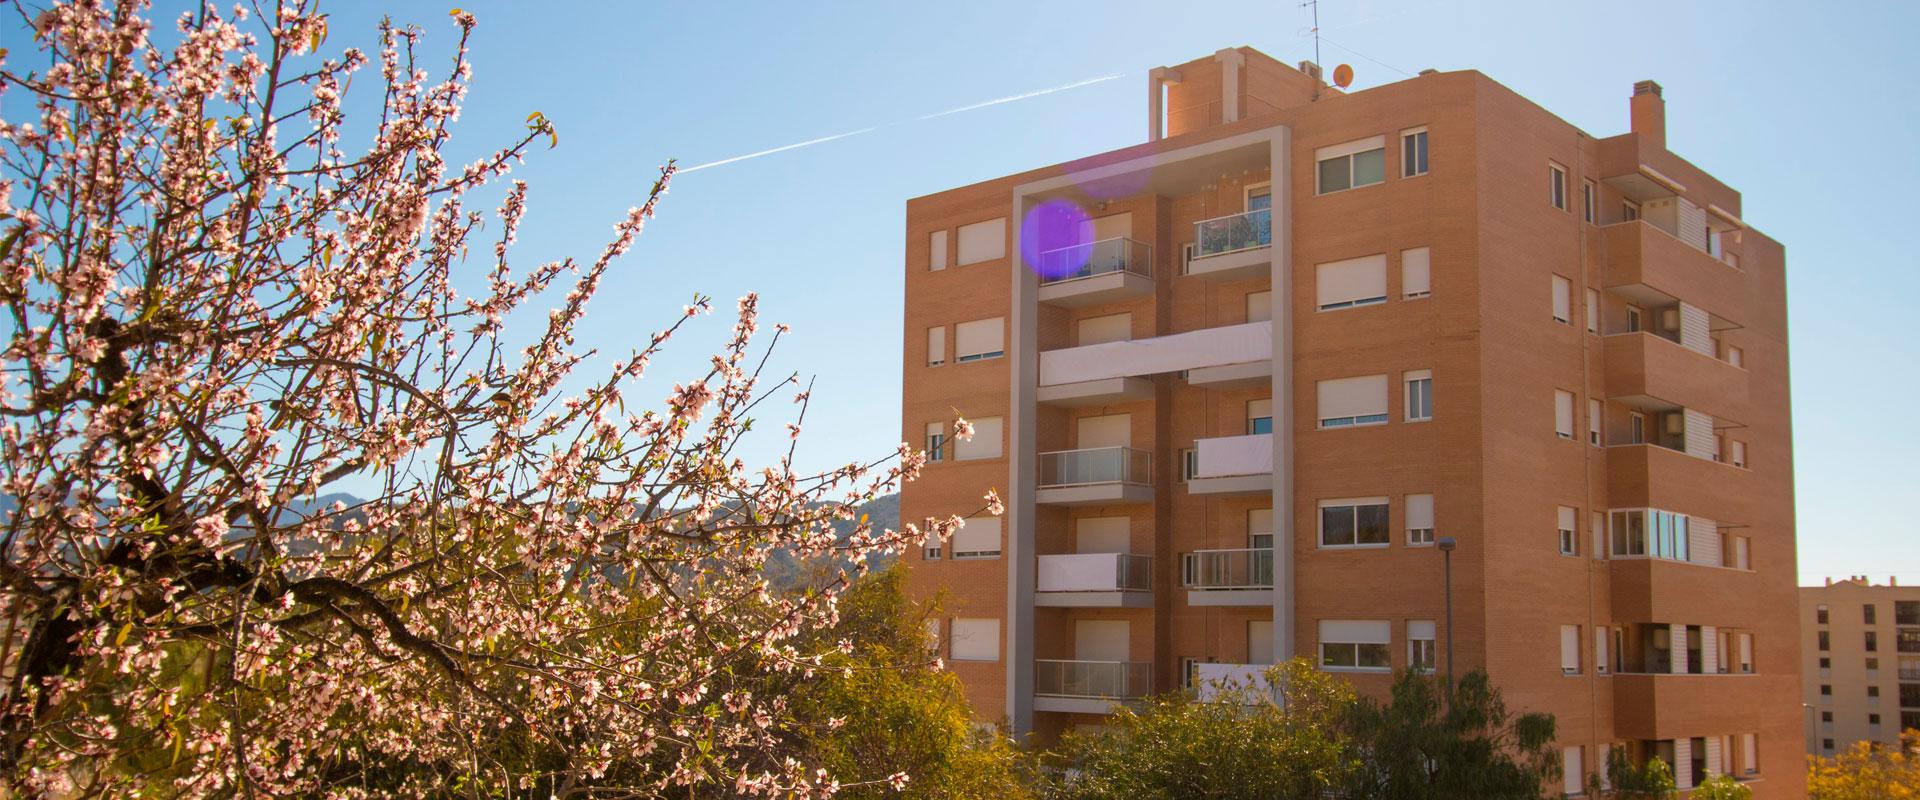 Edificio Jardín de Jijona Asa Promoción Inmobiliaria